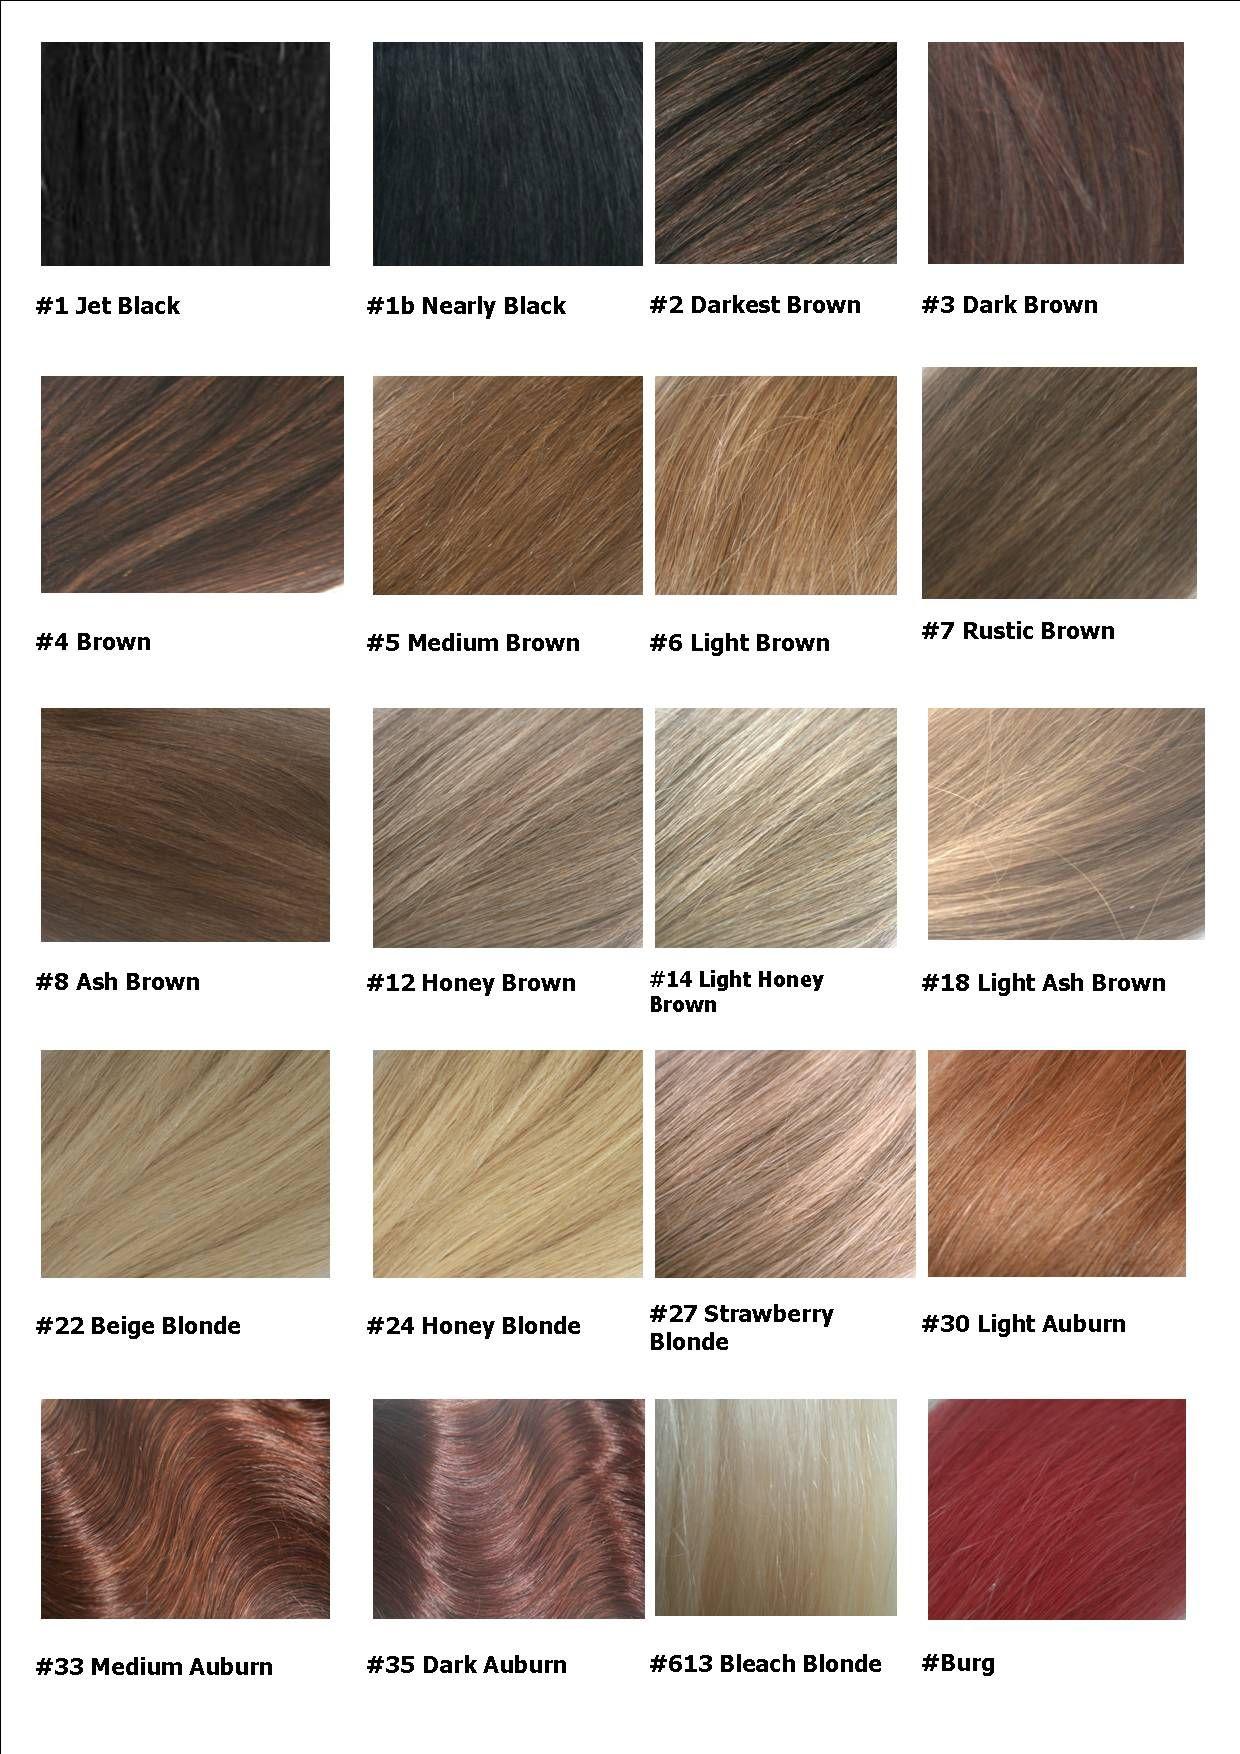 Hair Color Beige Blonde Hair Color Light Ash Brown Hair Blonde Hair Color Chart